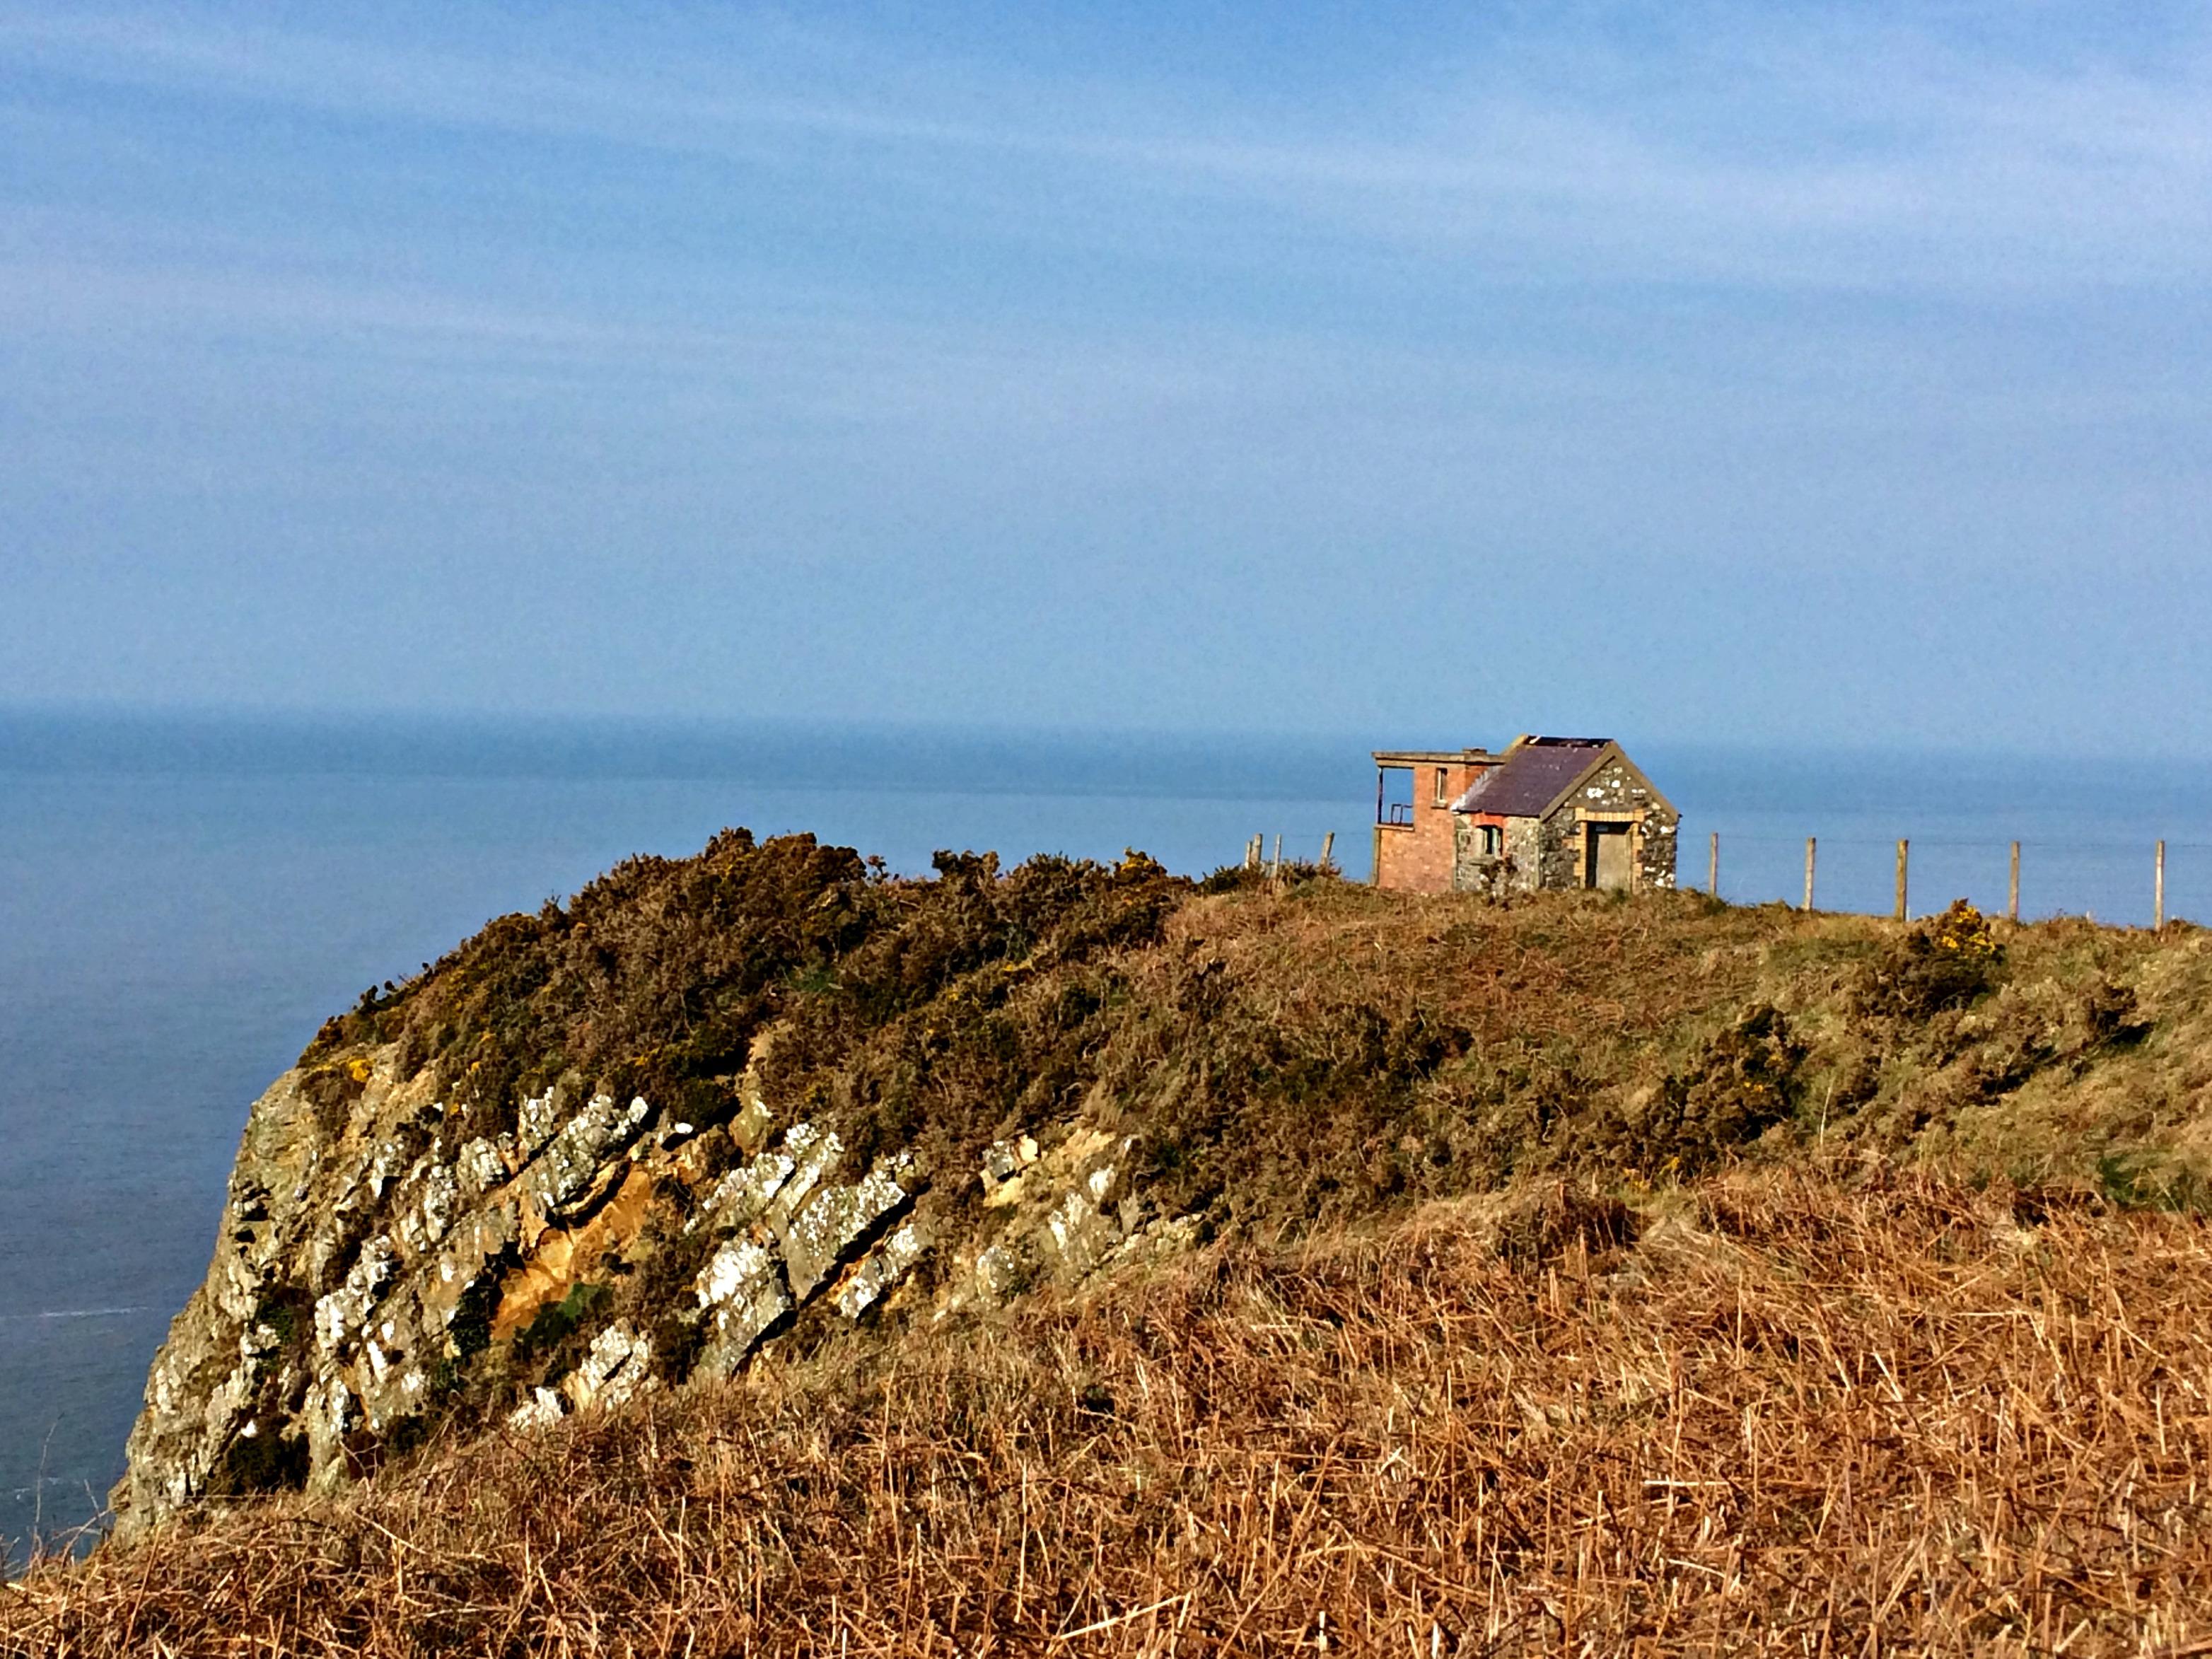 Old Coastguard lookout hut